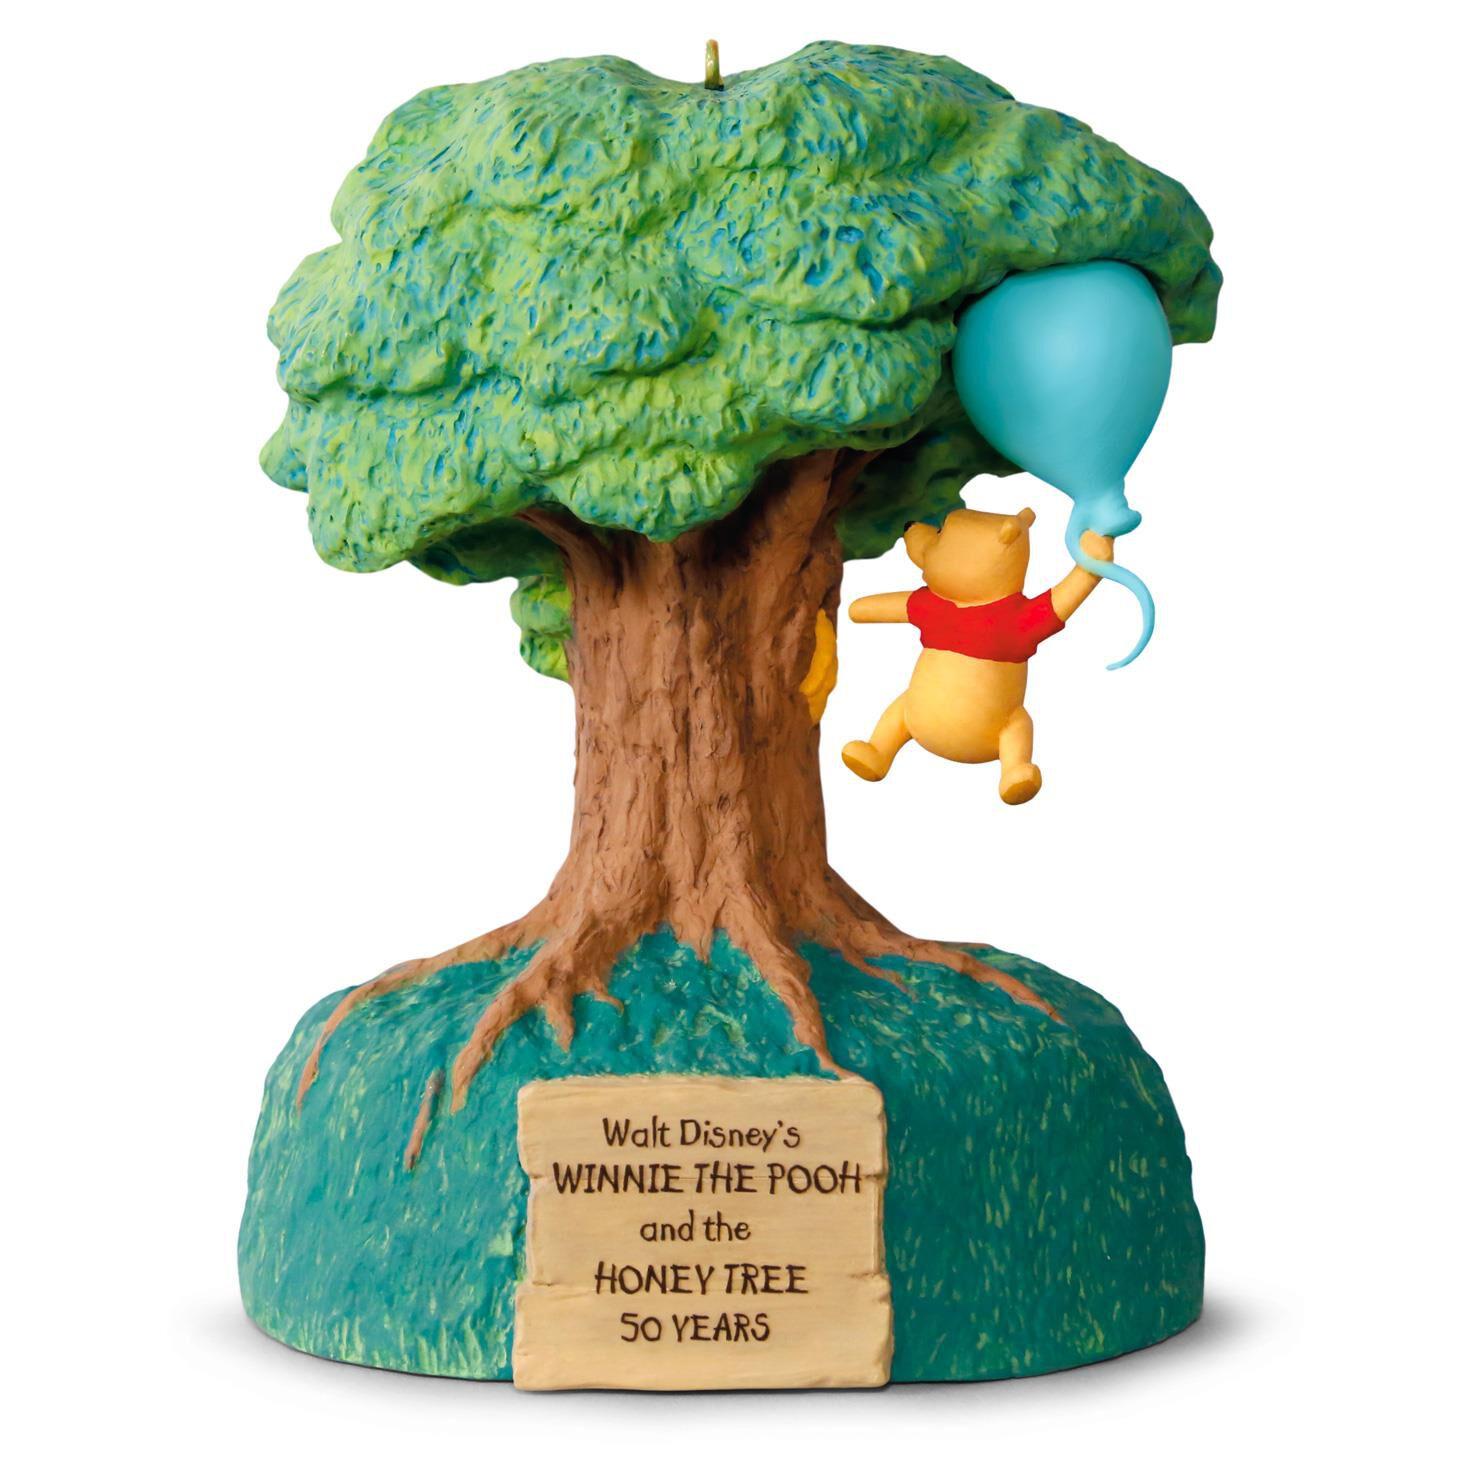 Disney Winnie The Pooh And Honey Tree 50th Anniversary Music Motion Ornament Keepsake Ornaments Hallmark